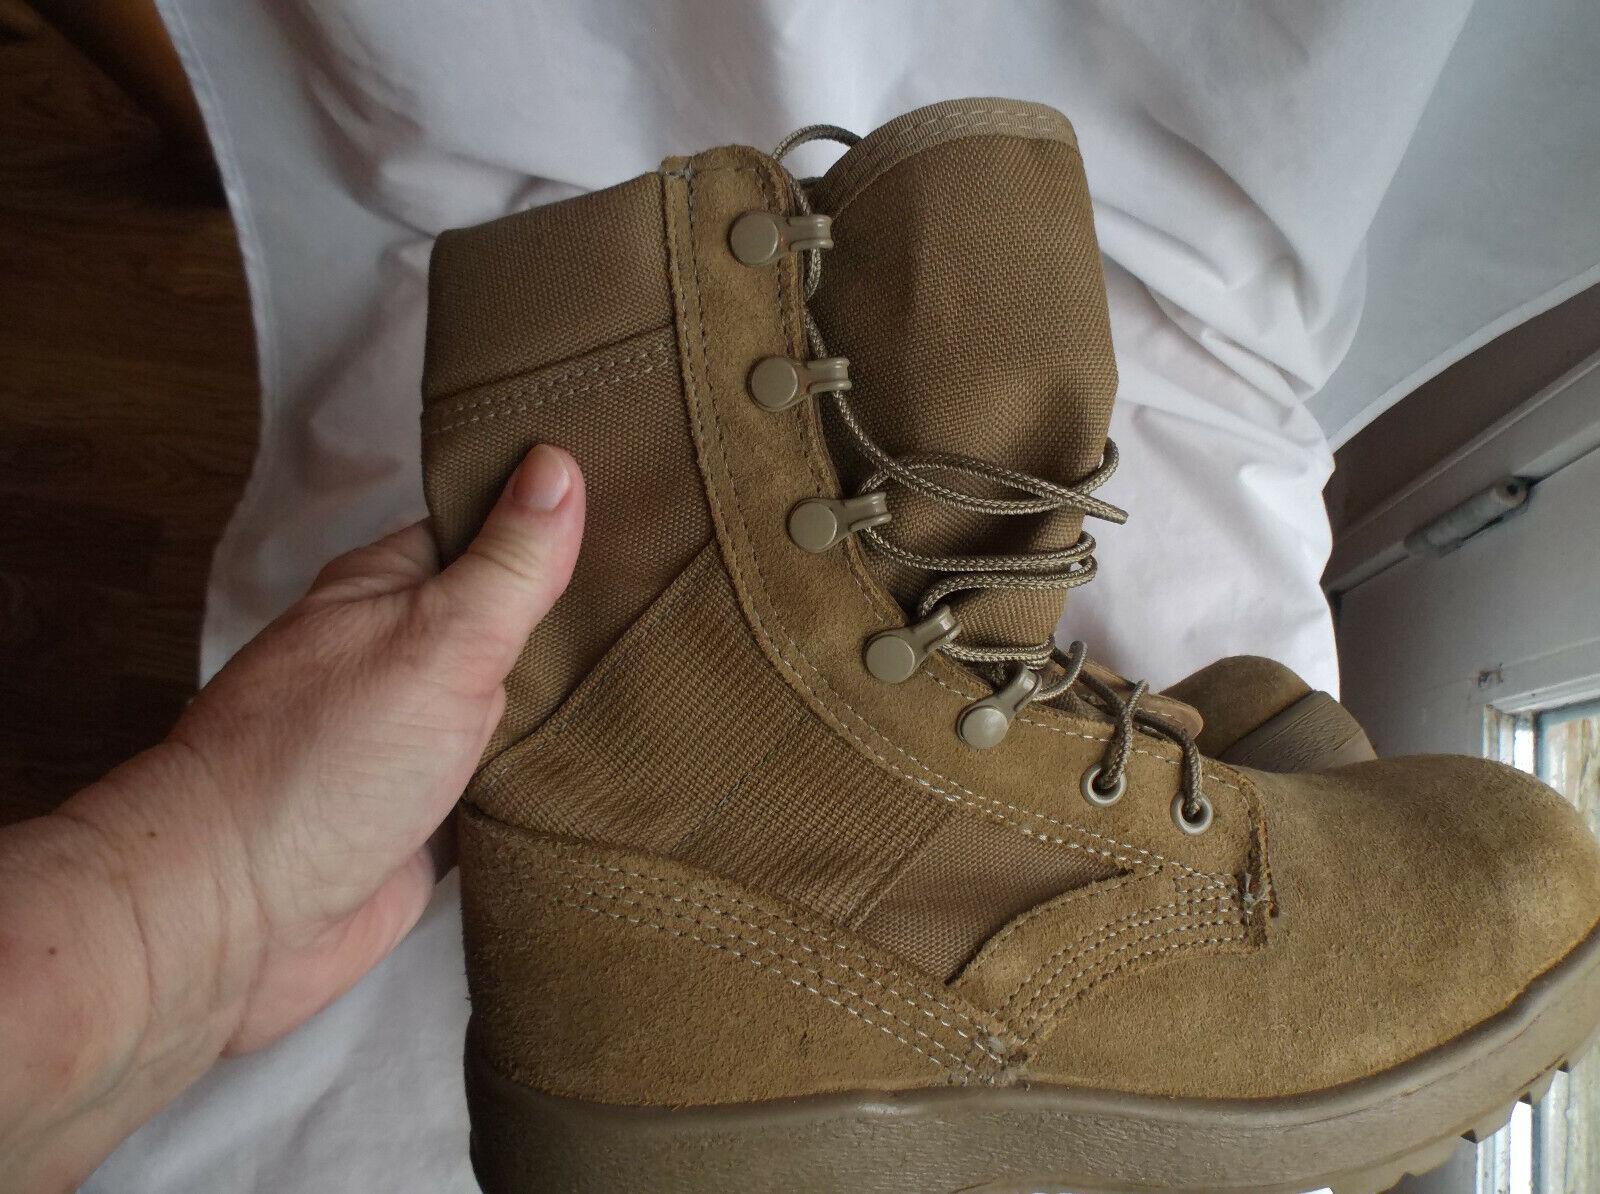 Mc Rae 8  Mil-spec clima caliente botas militares, tamaño 6R para Hombre & 8R señoras,  Excelente